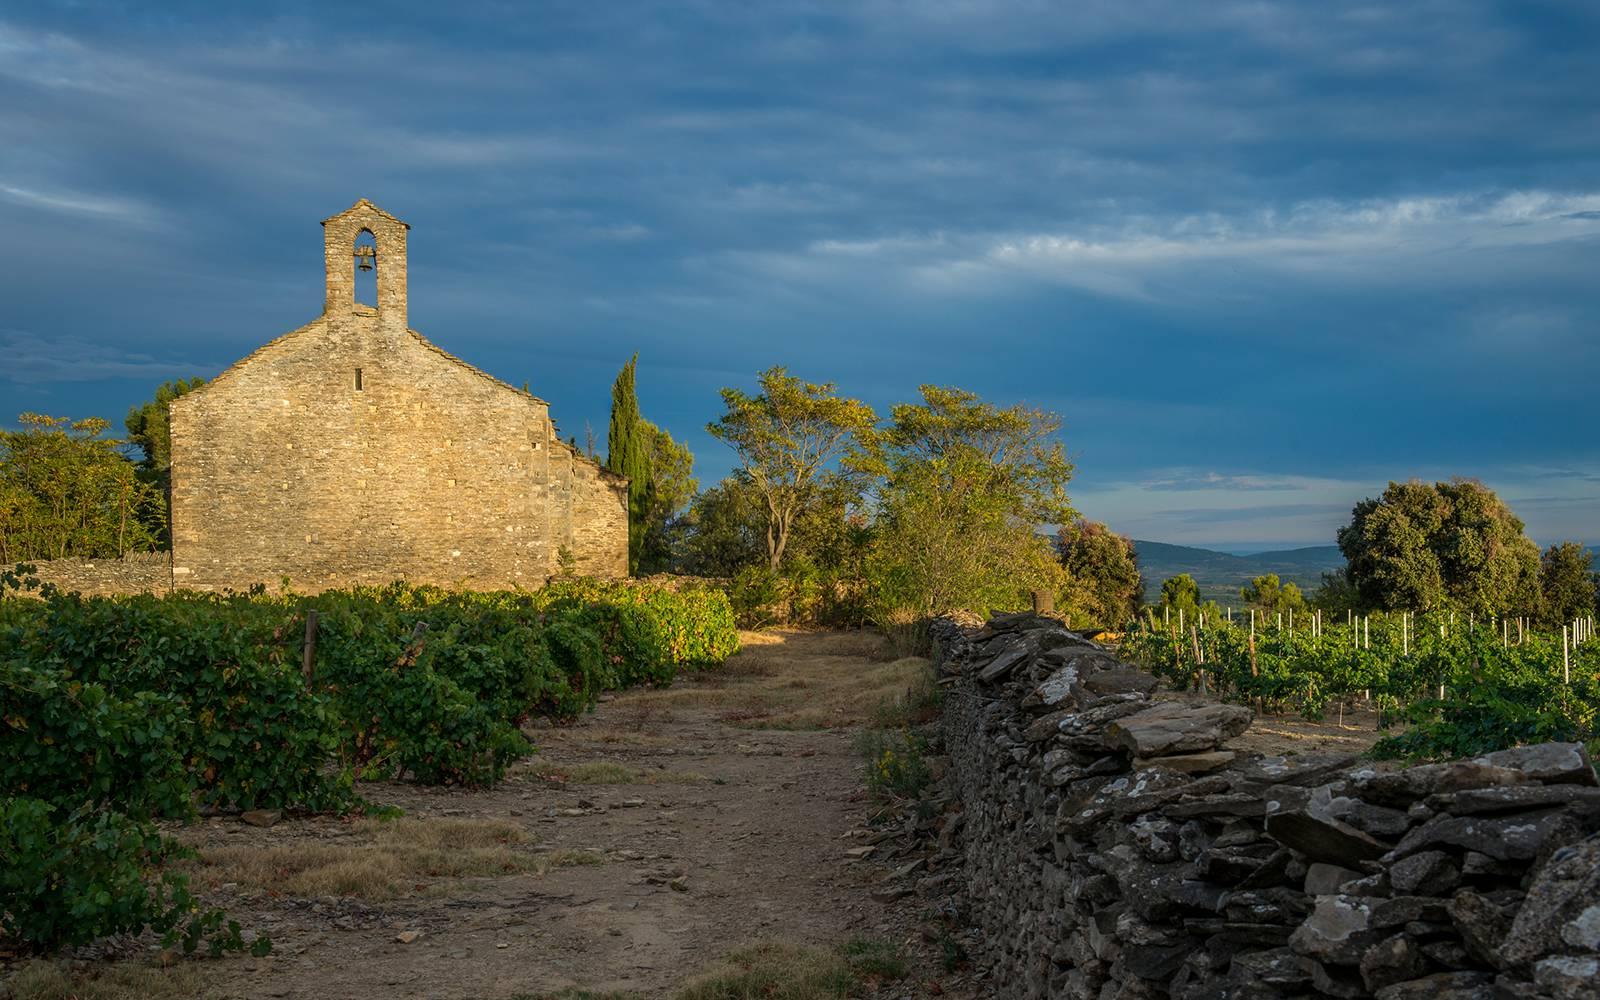 pic of church